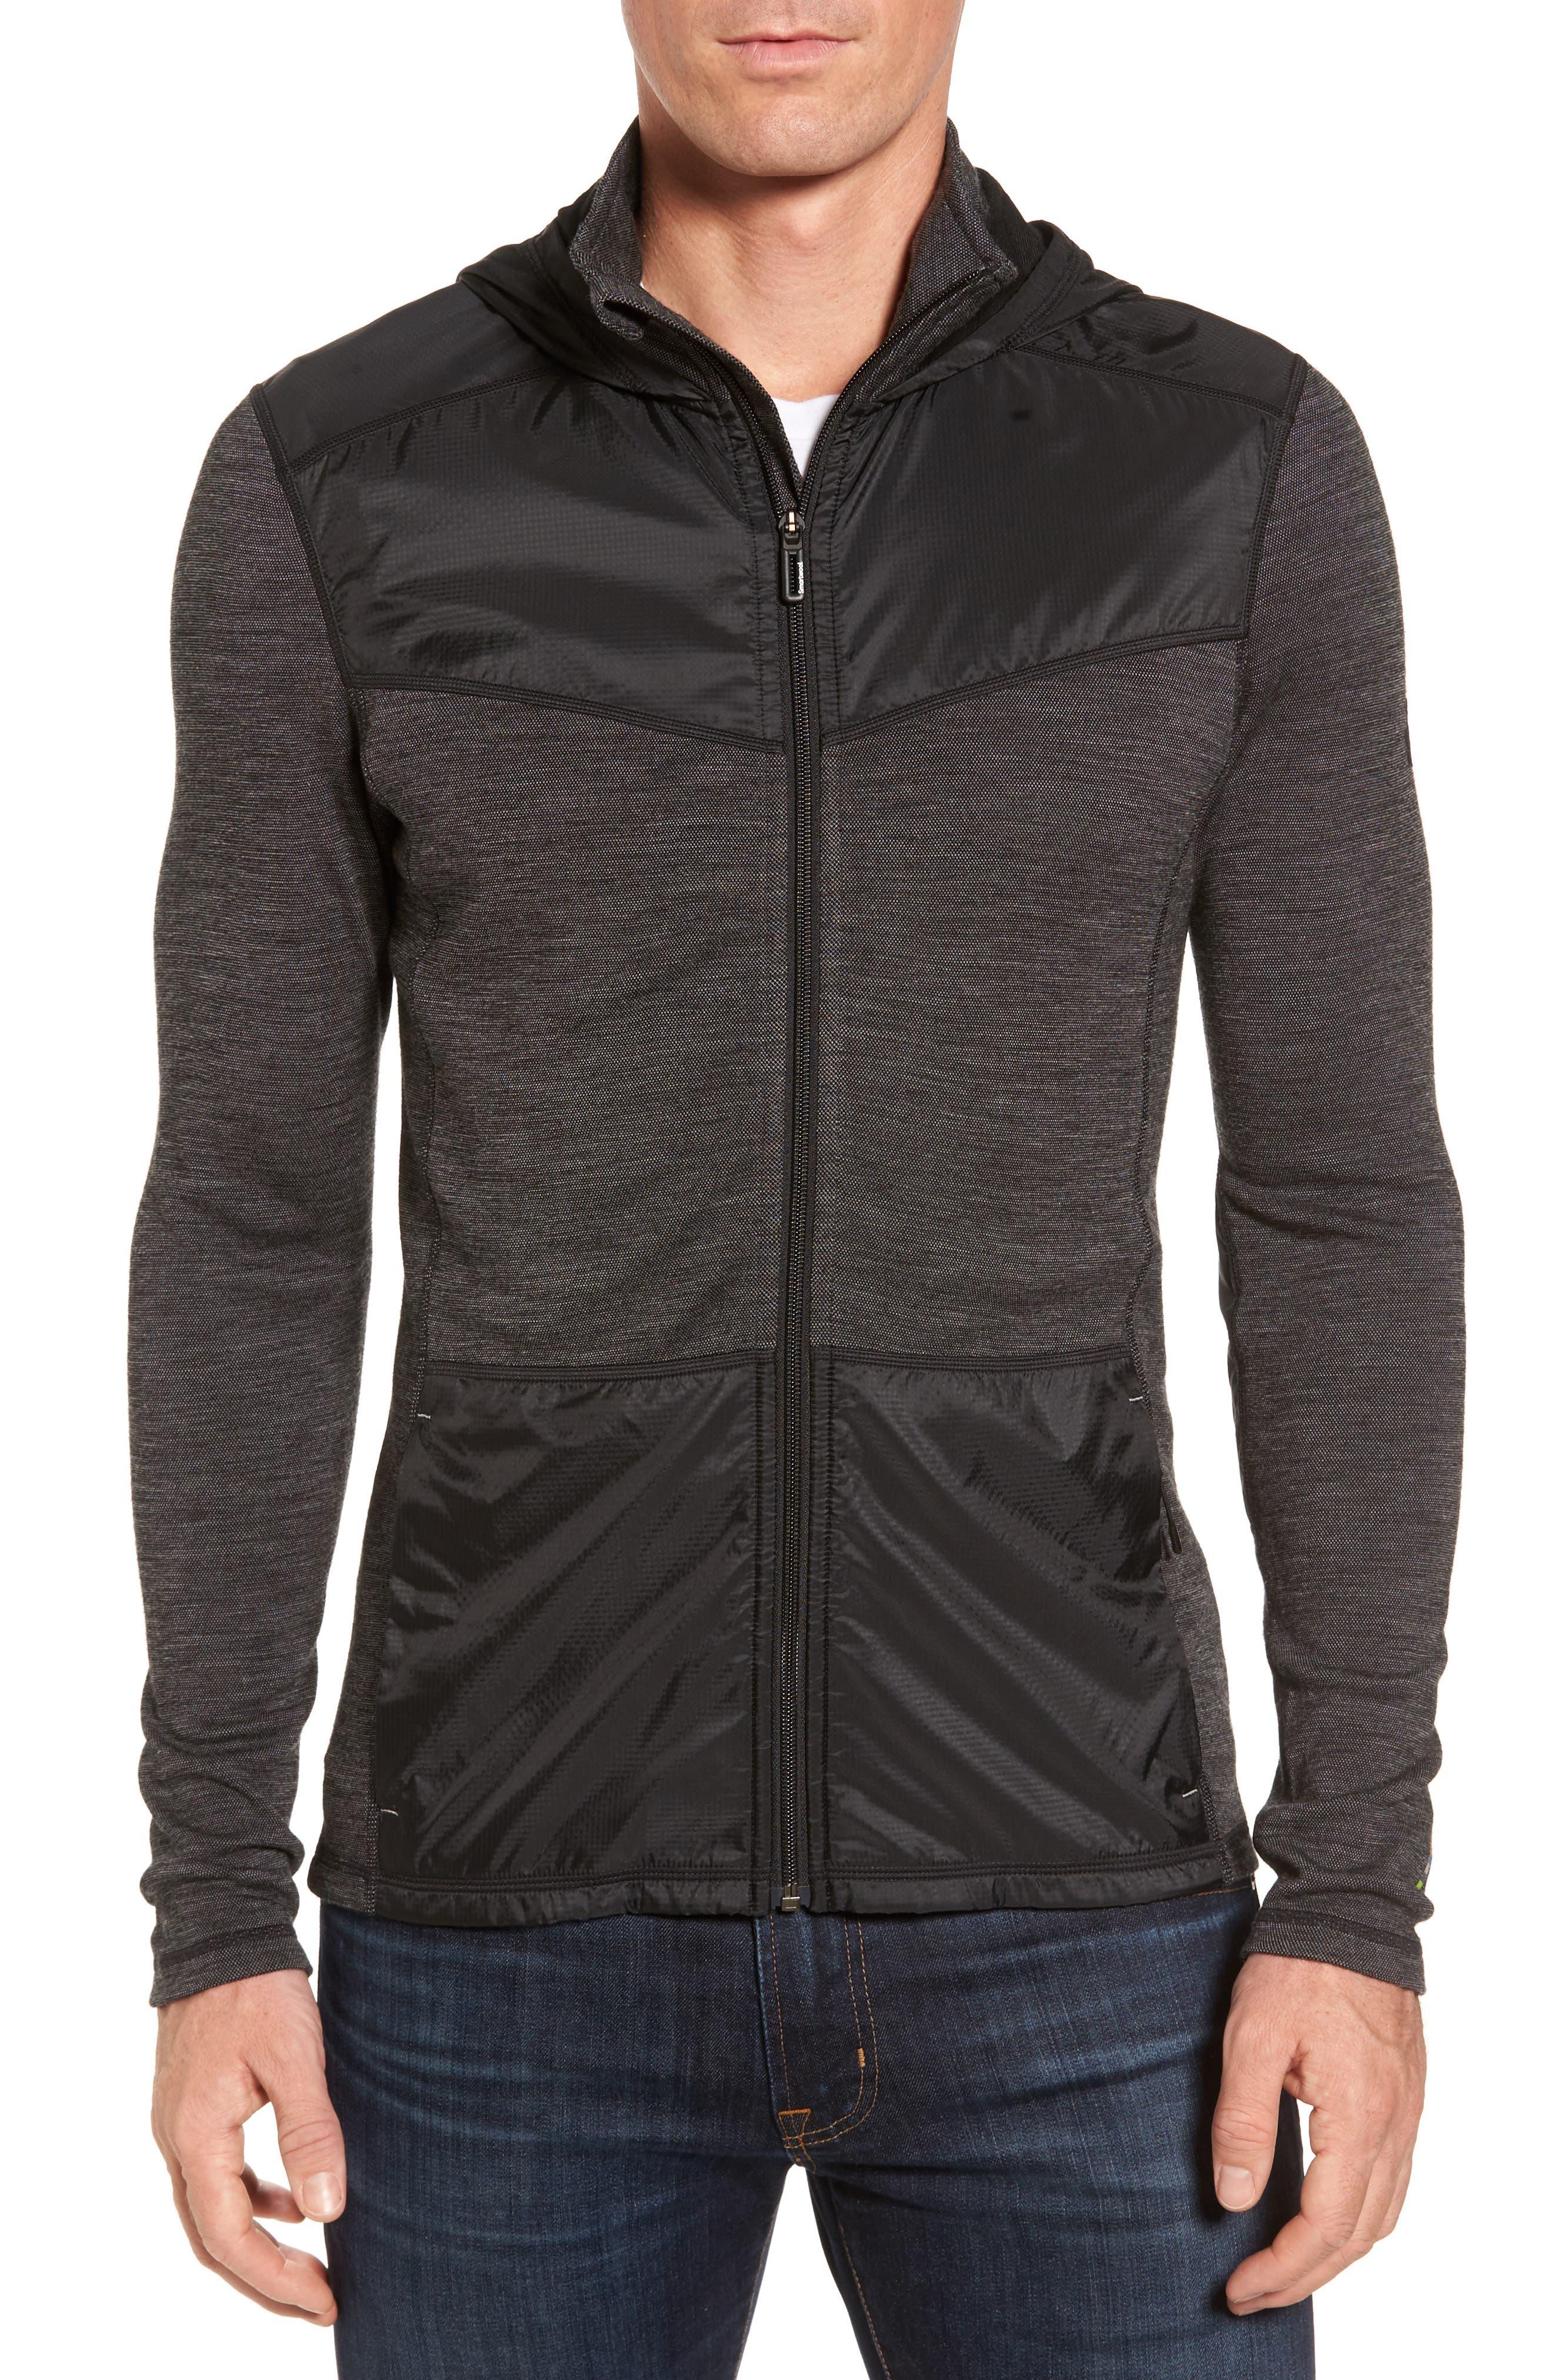 250 Sport Merino Wool Jacket,                             Main thumbnail 1, color,                             Black